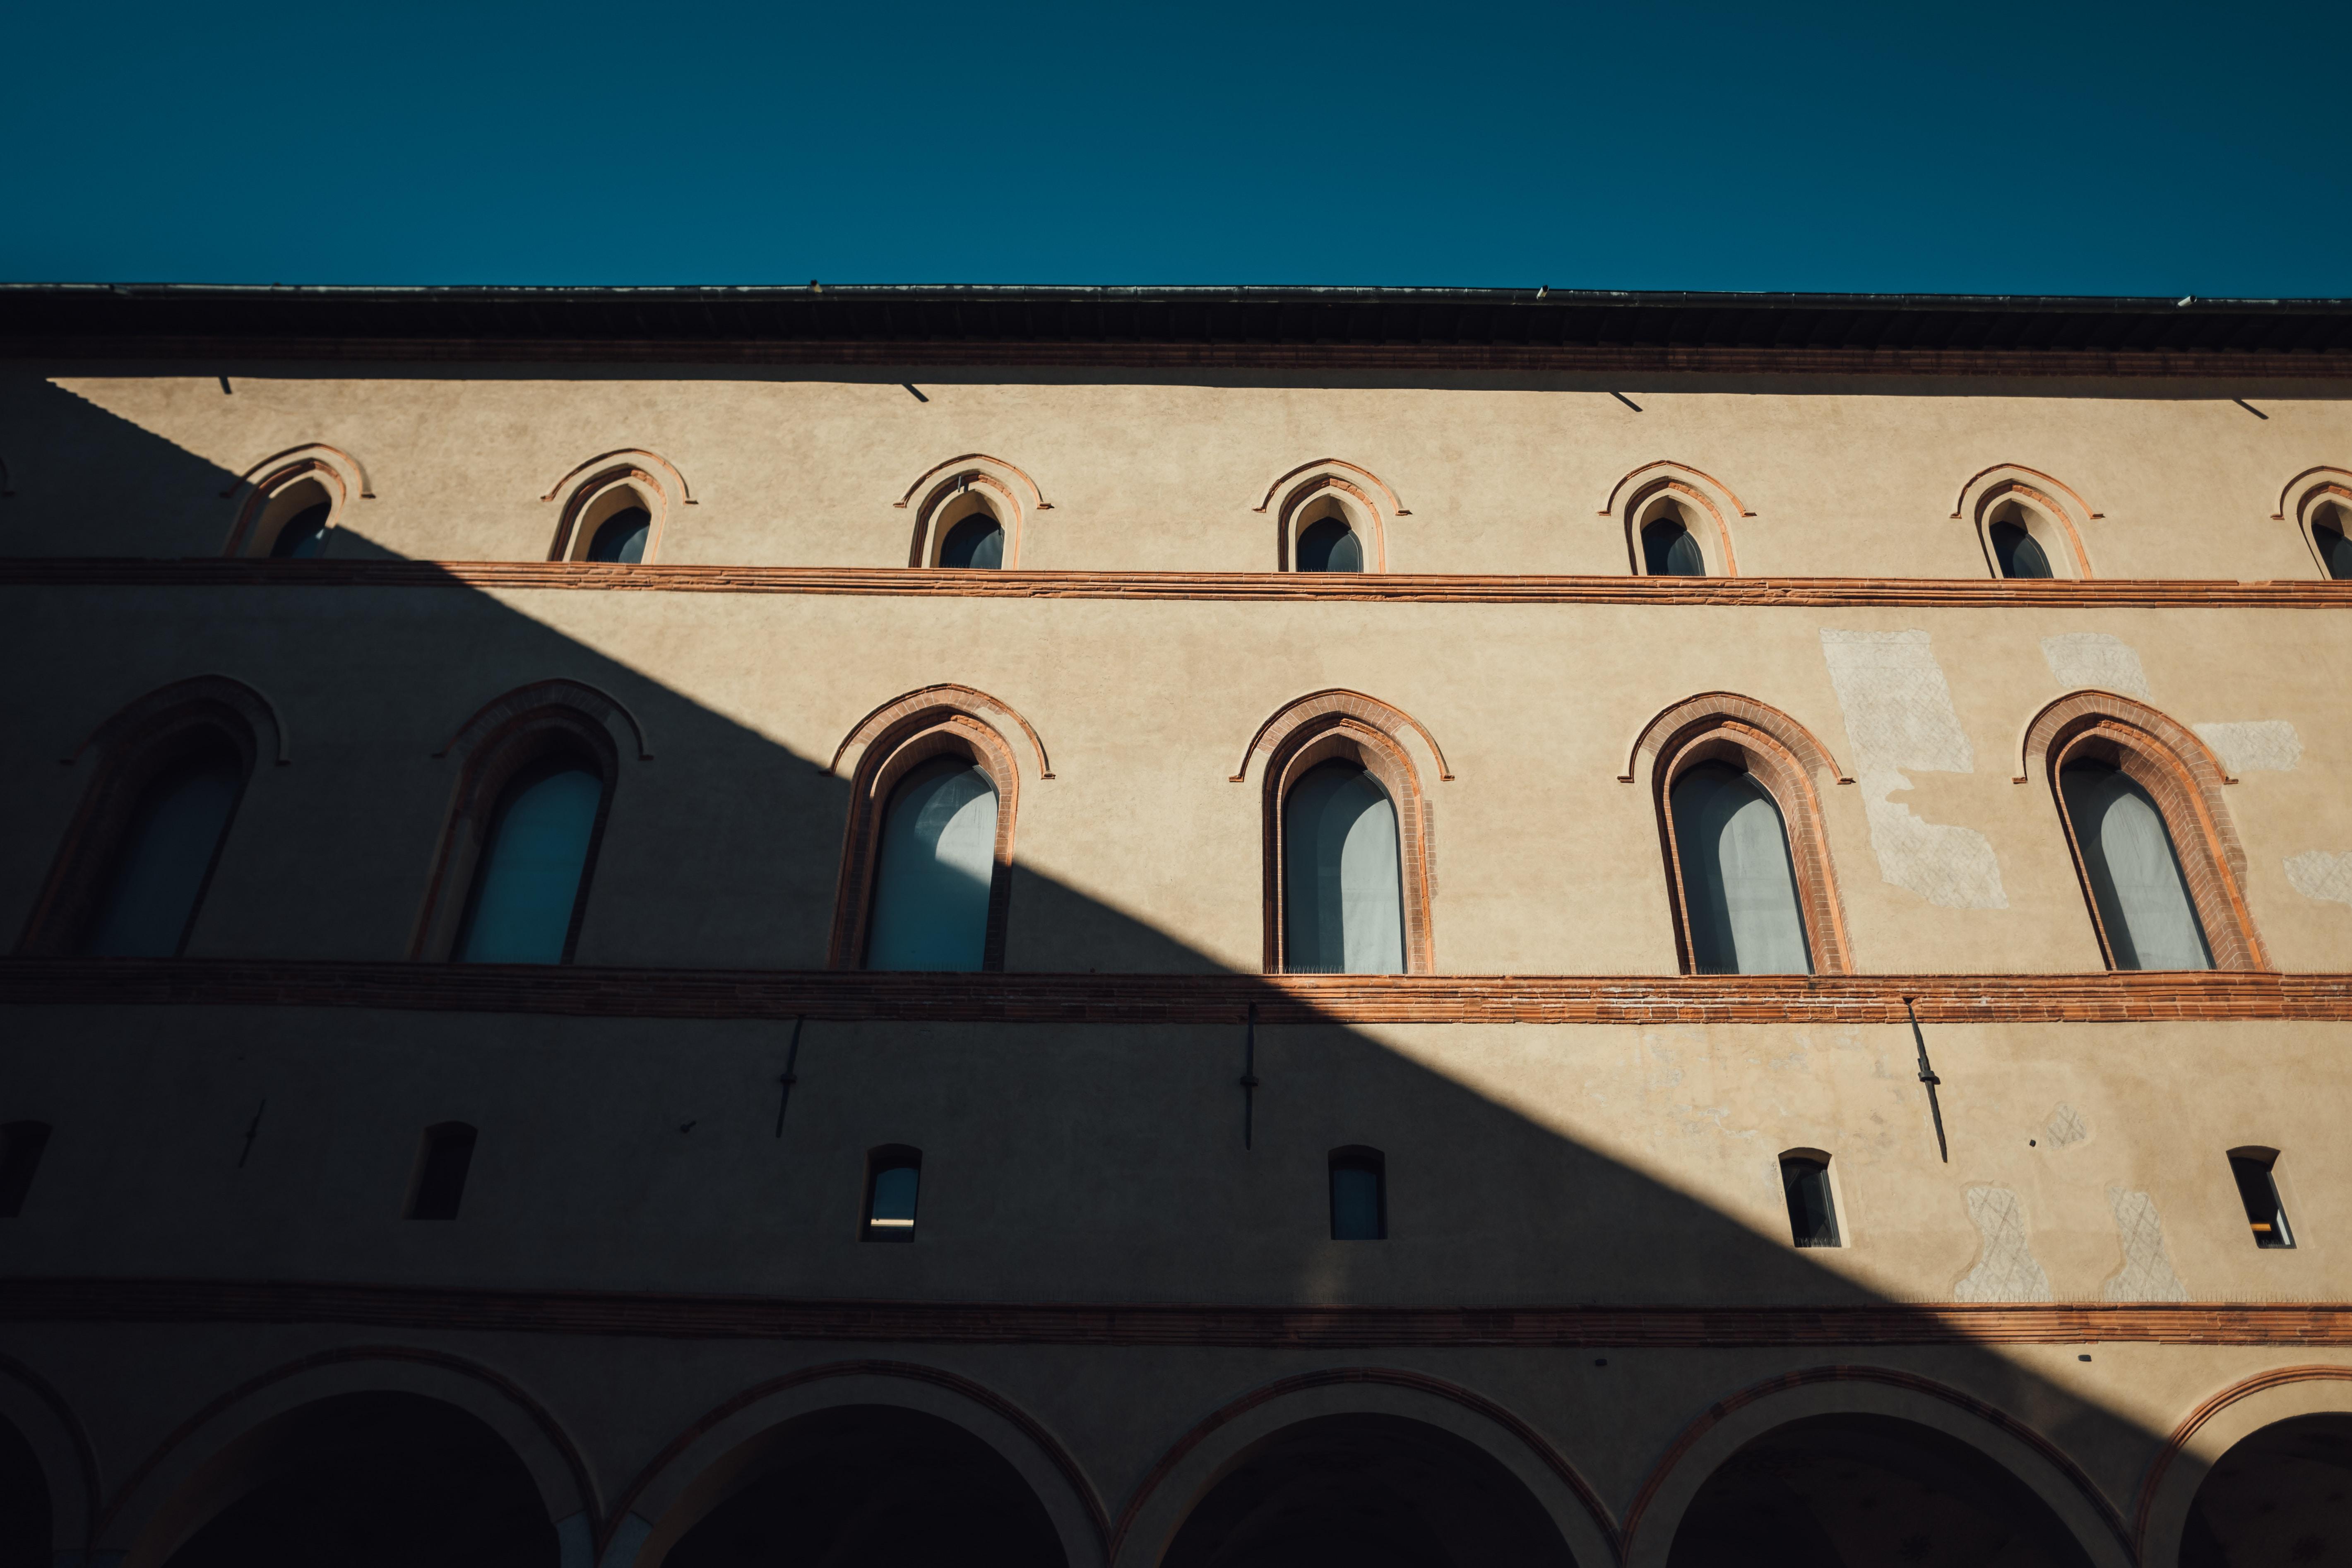 sun shining over a beige concrete building